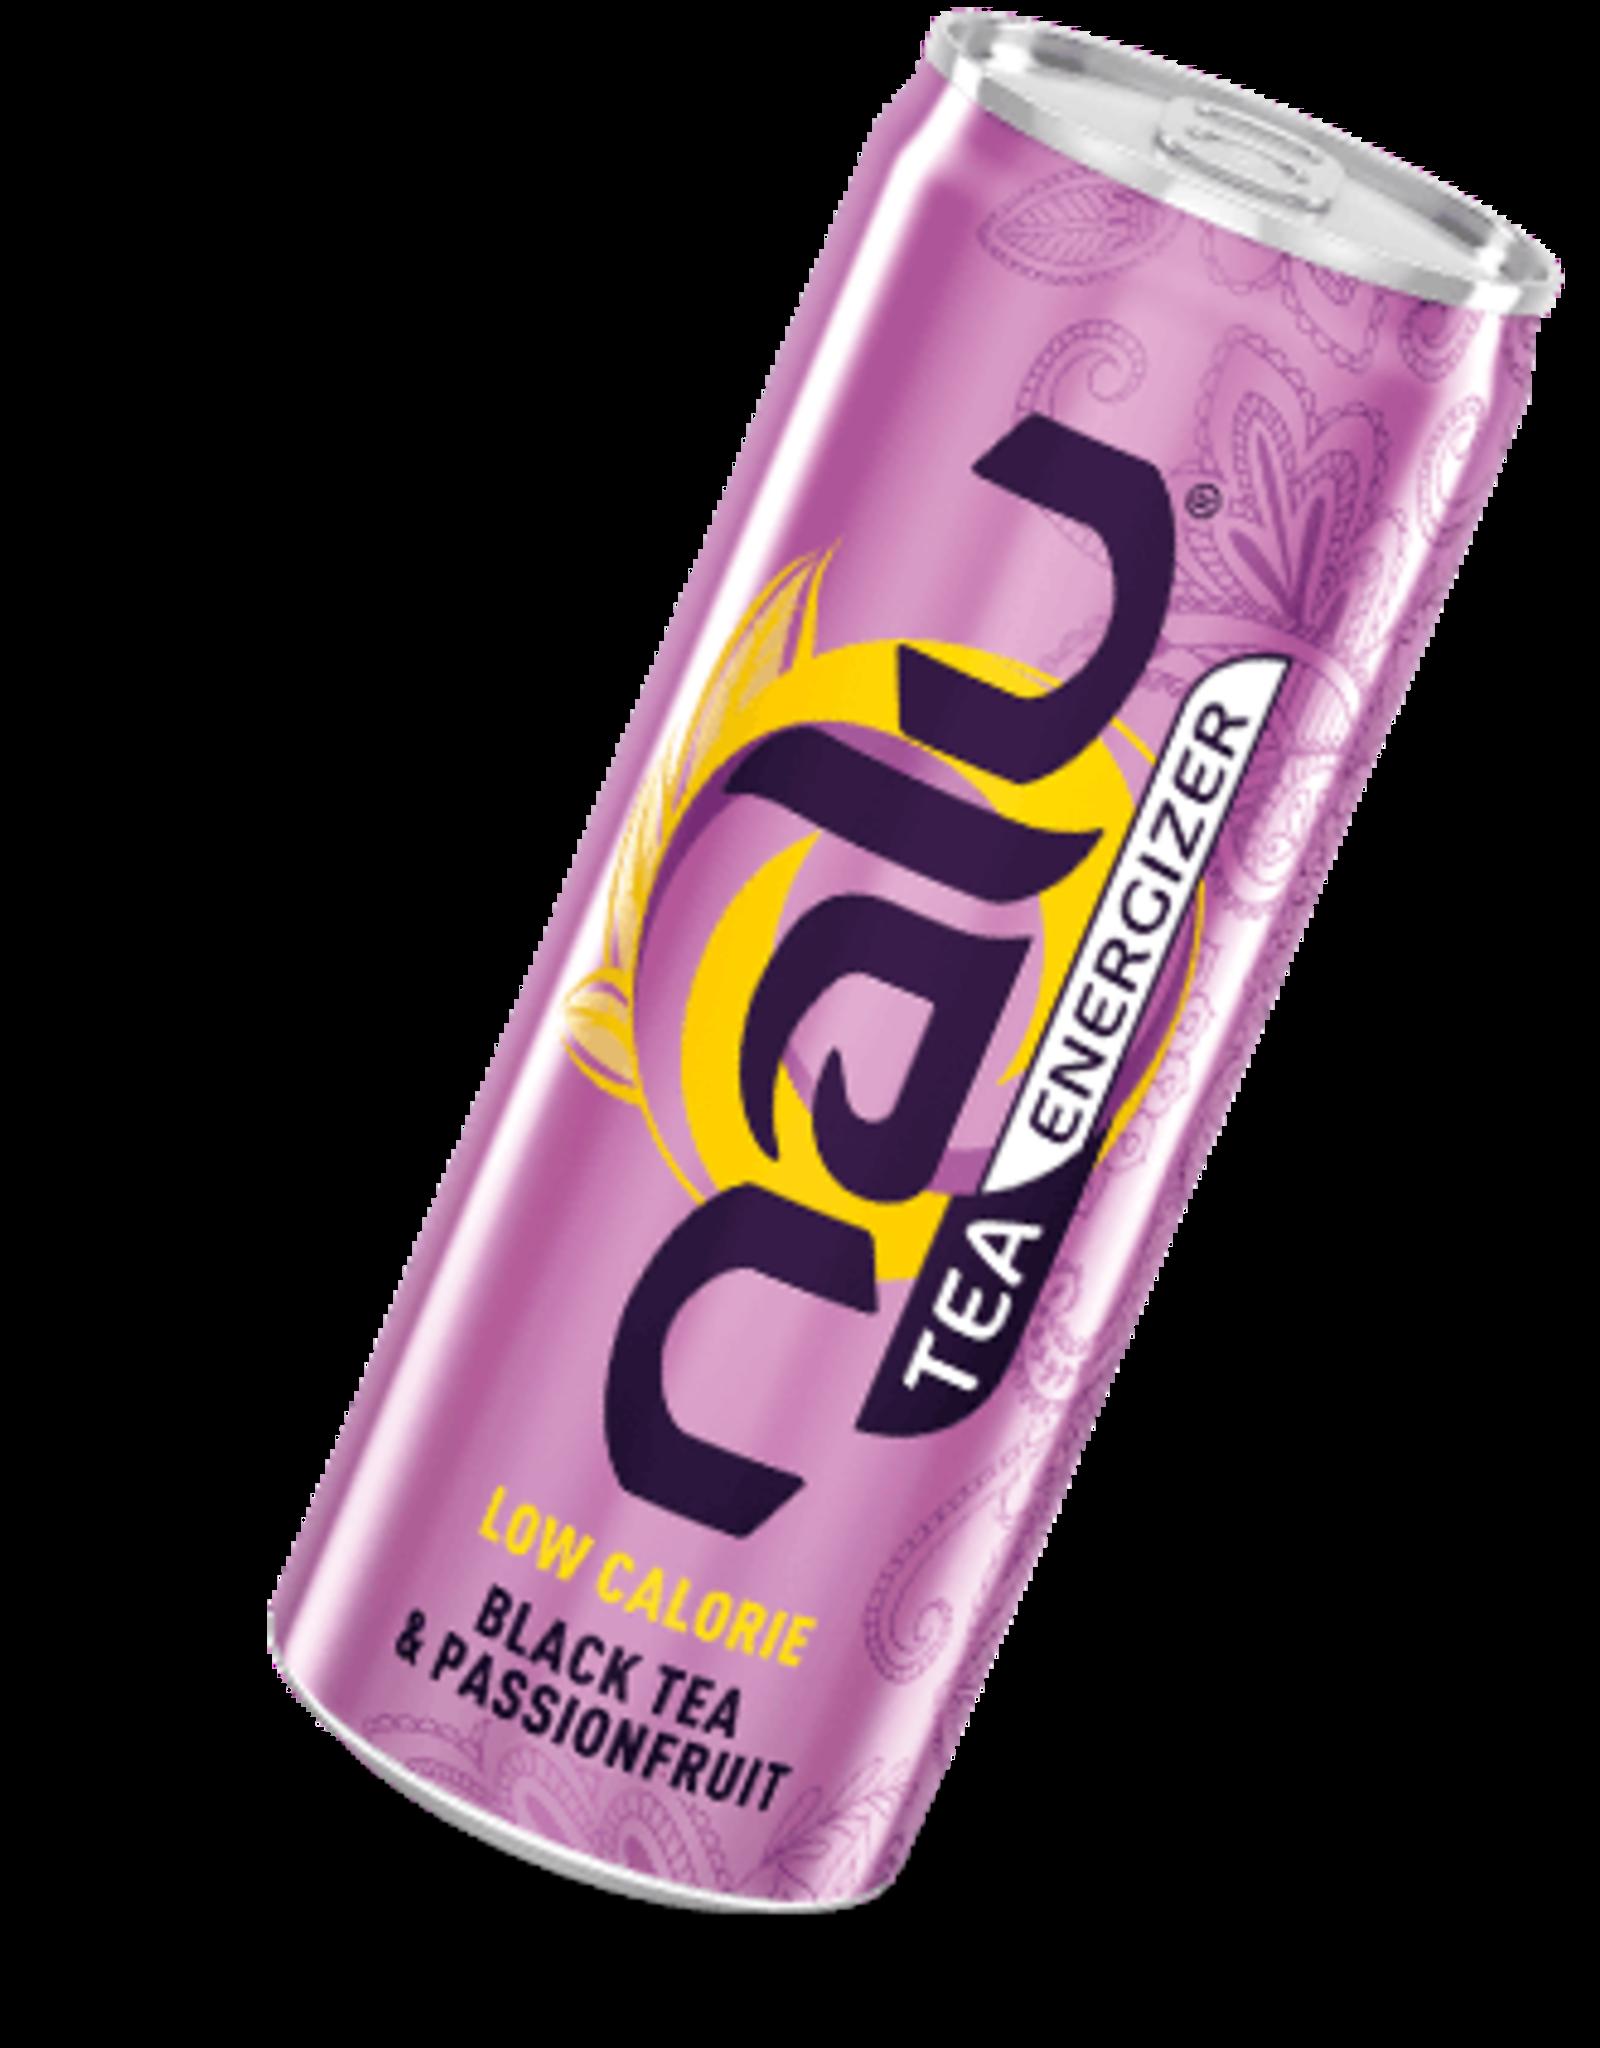 Energy Beverages NALU Black Tea & Passionfruit 25cl